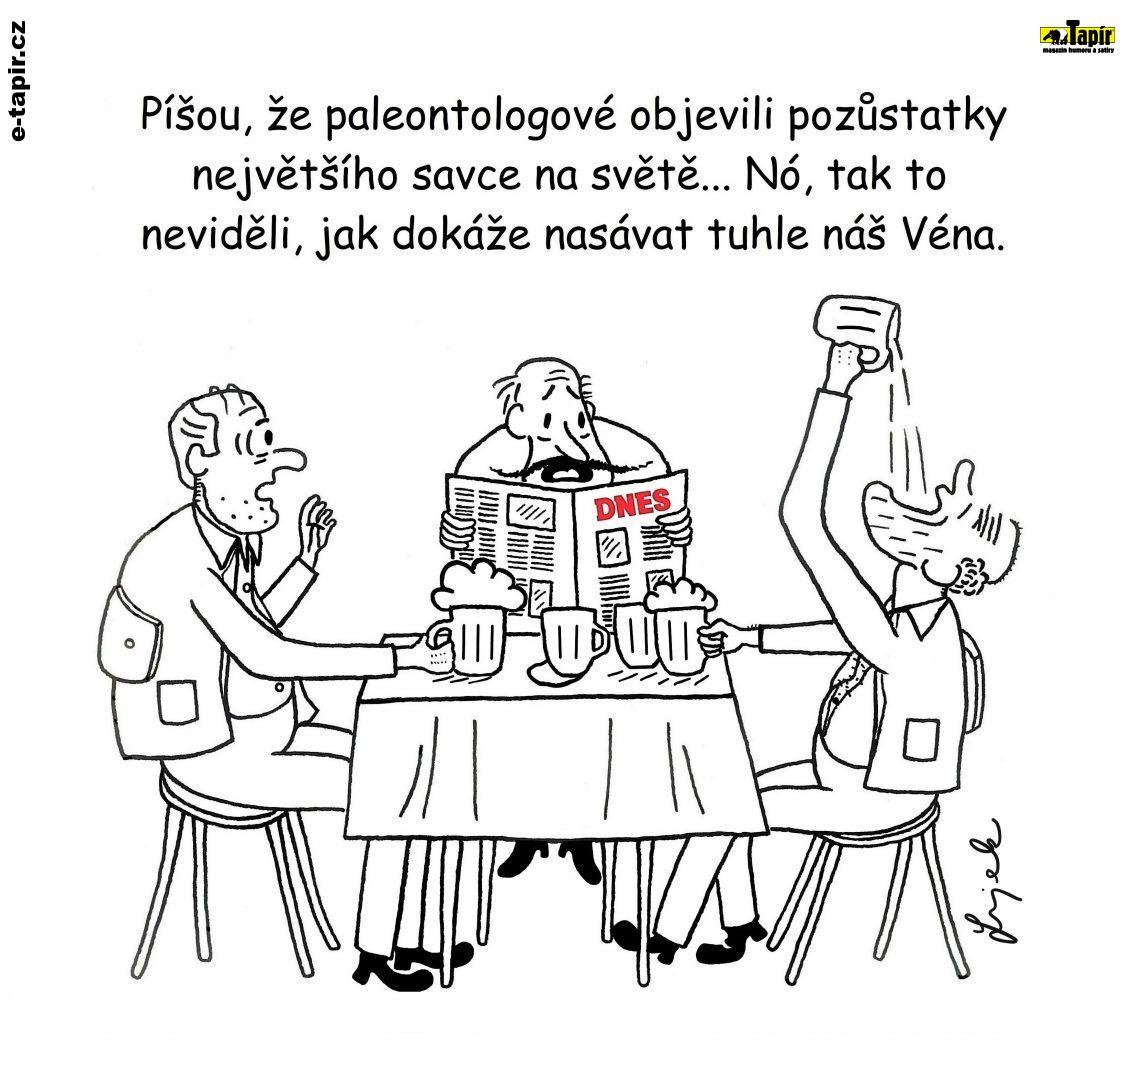 Tomas Lojek - Hospoda-331d8969